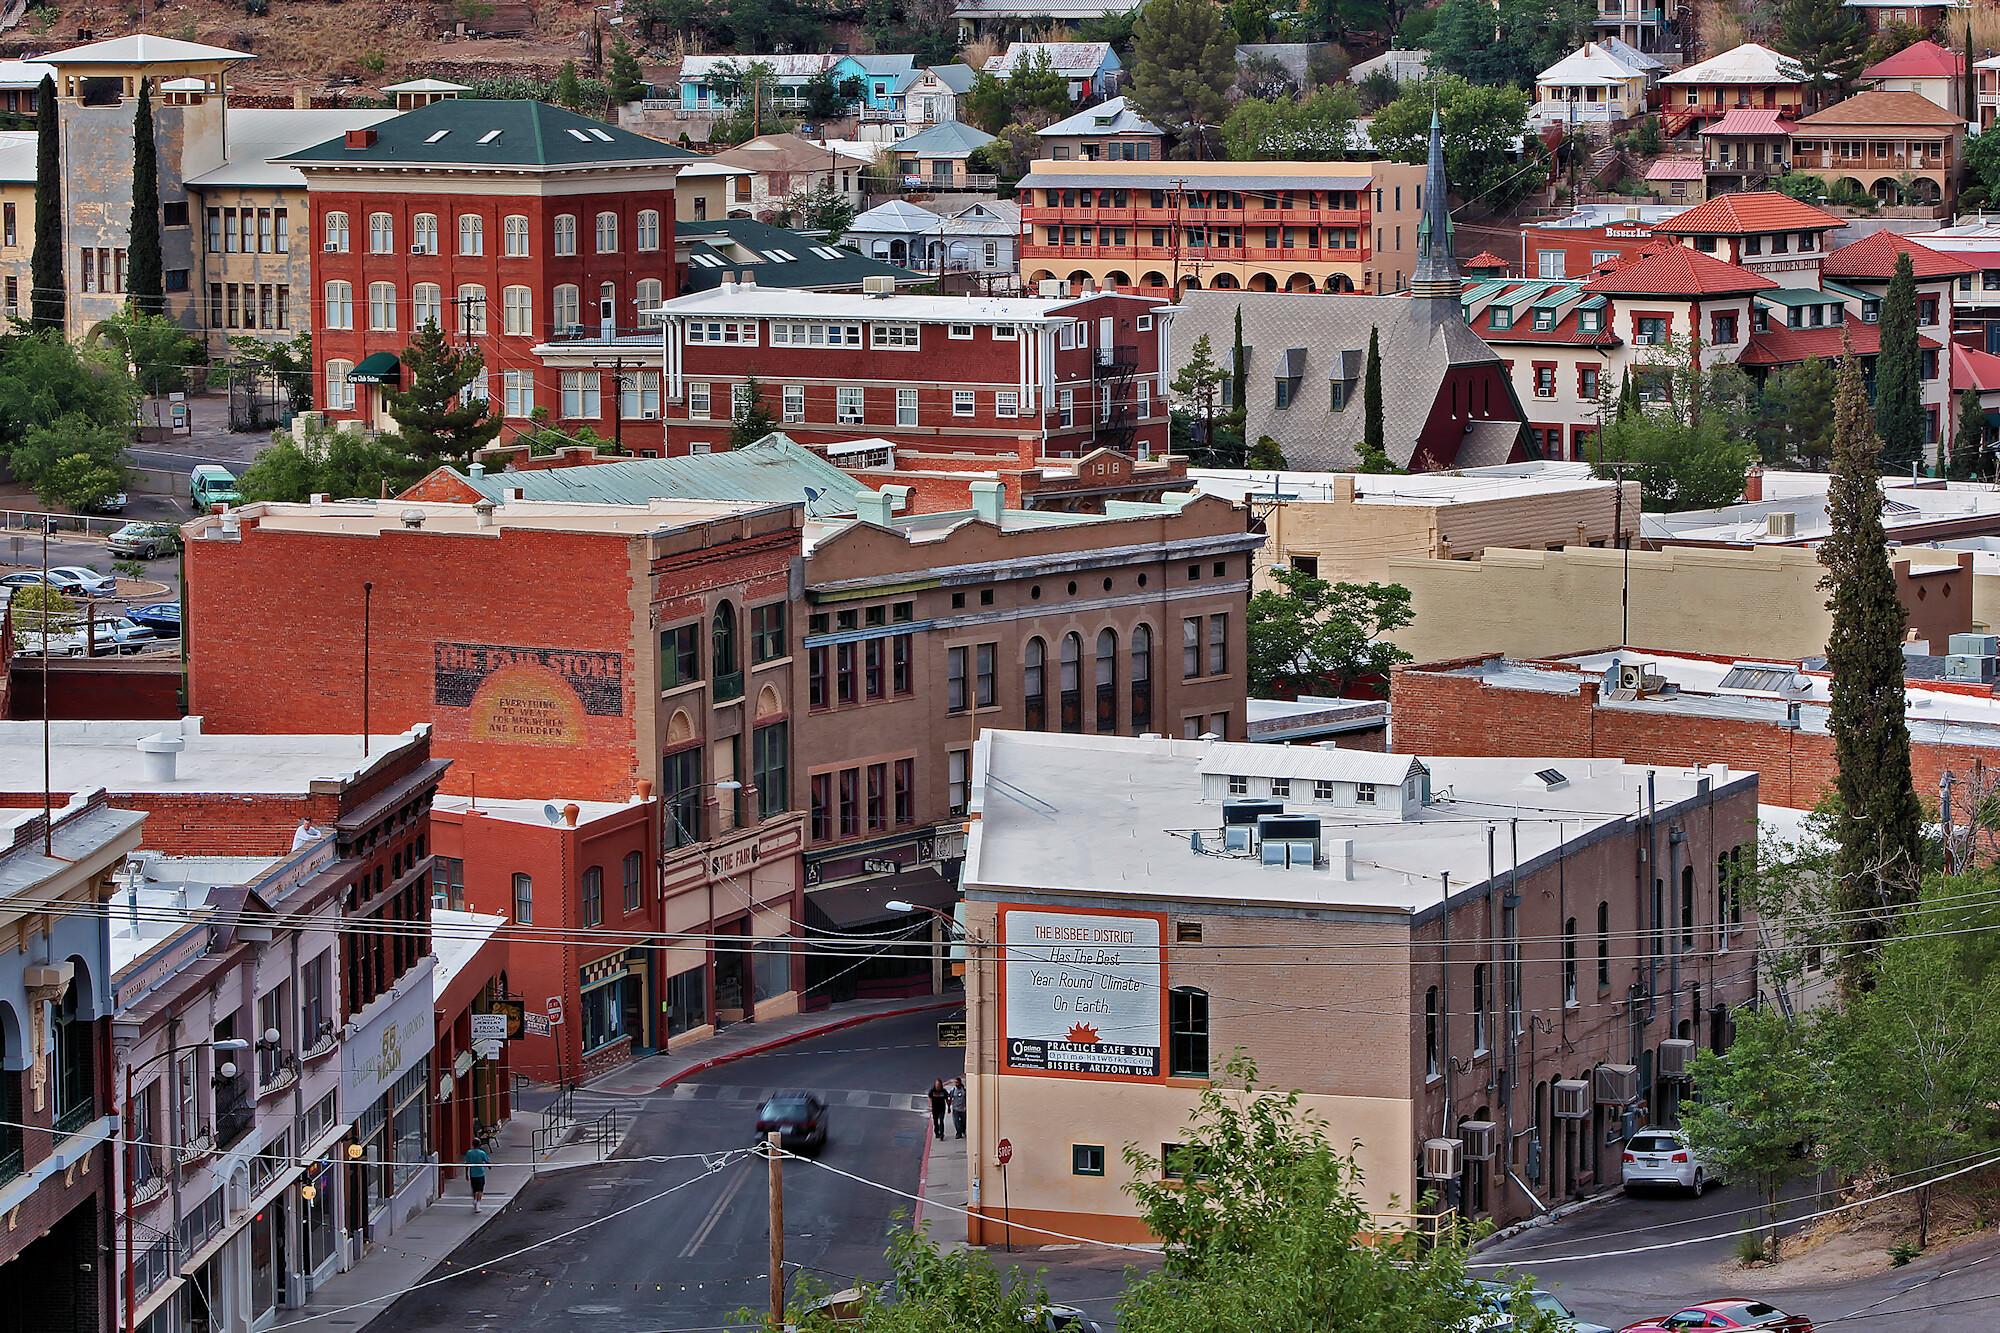 Aerial shot of downtown Bisbee, Arizona.